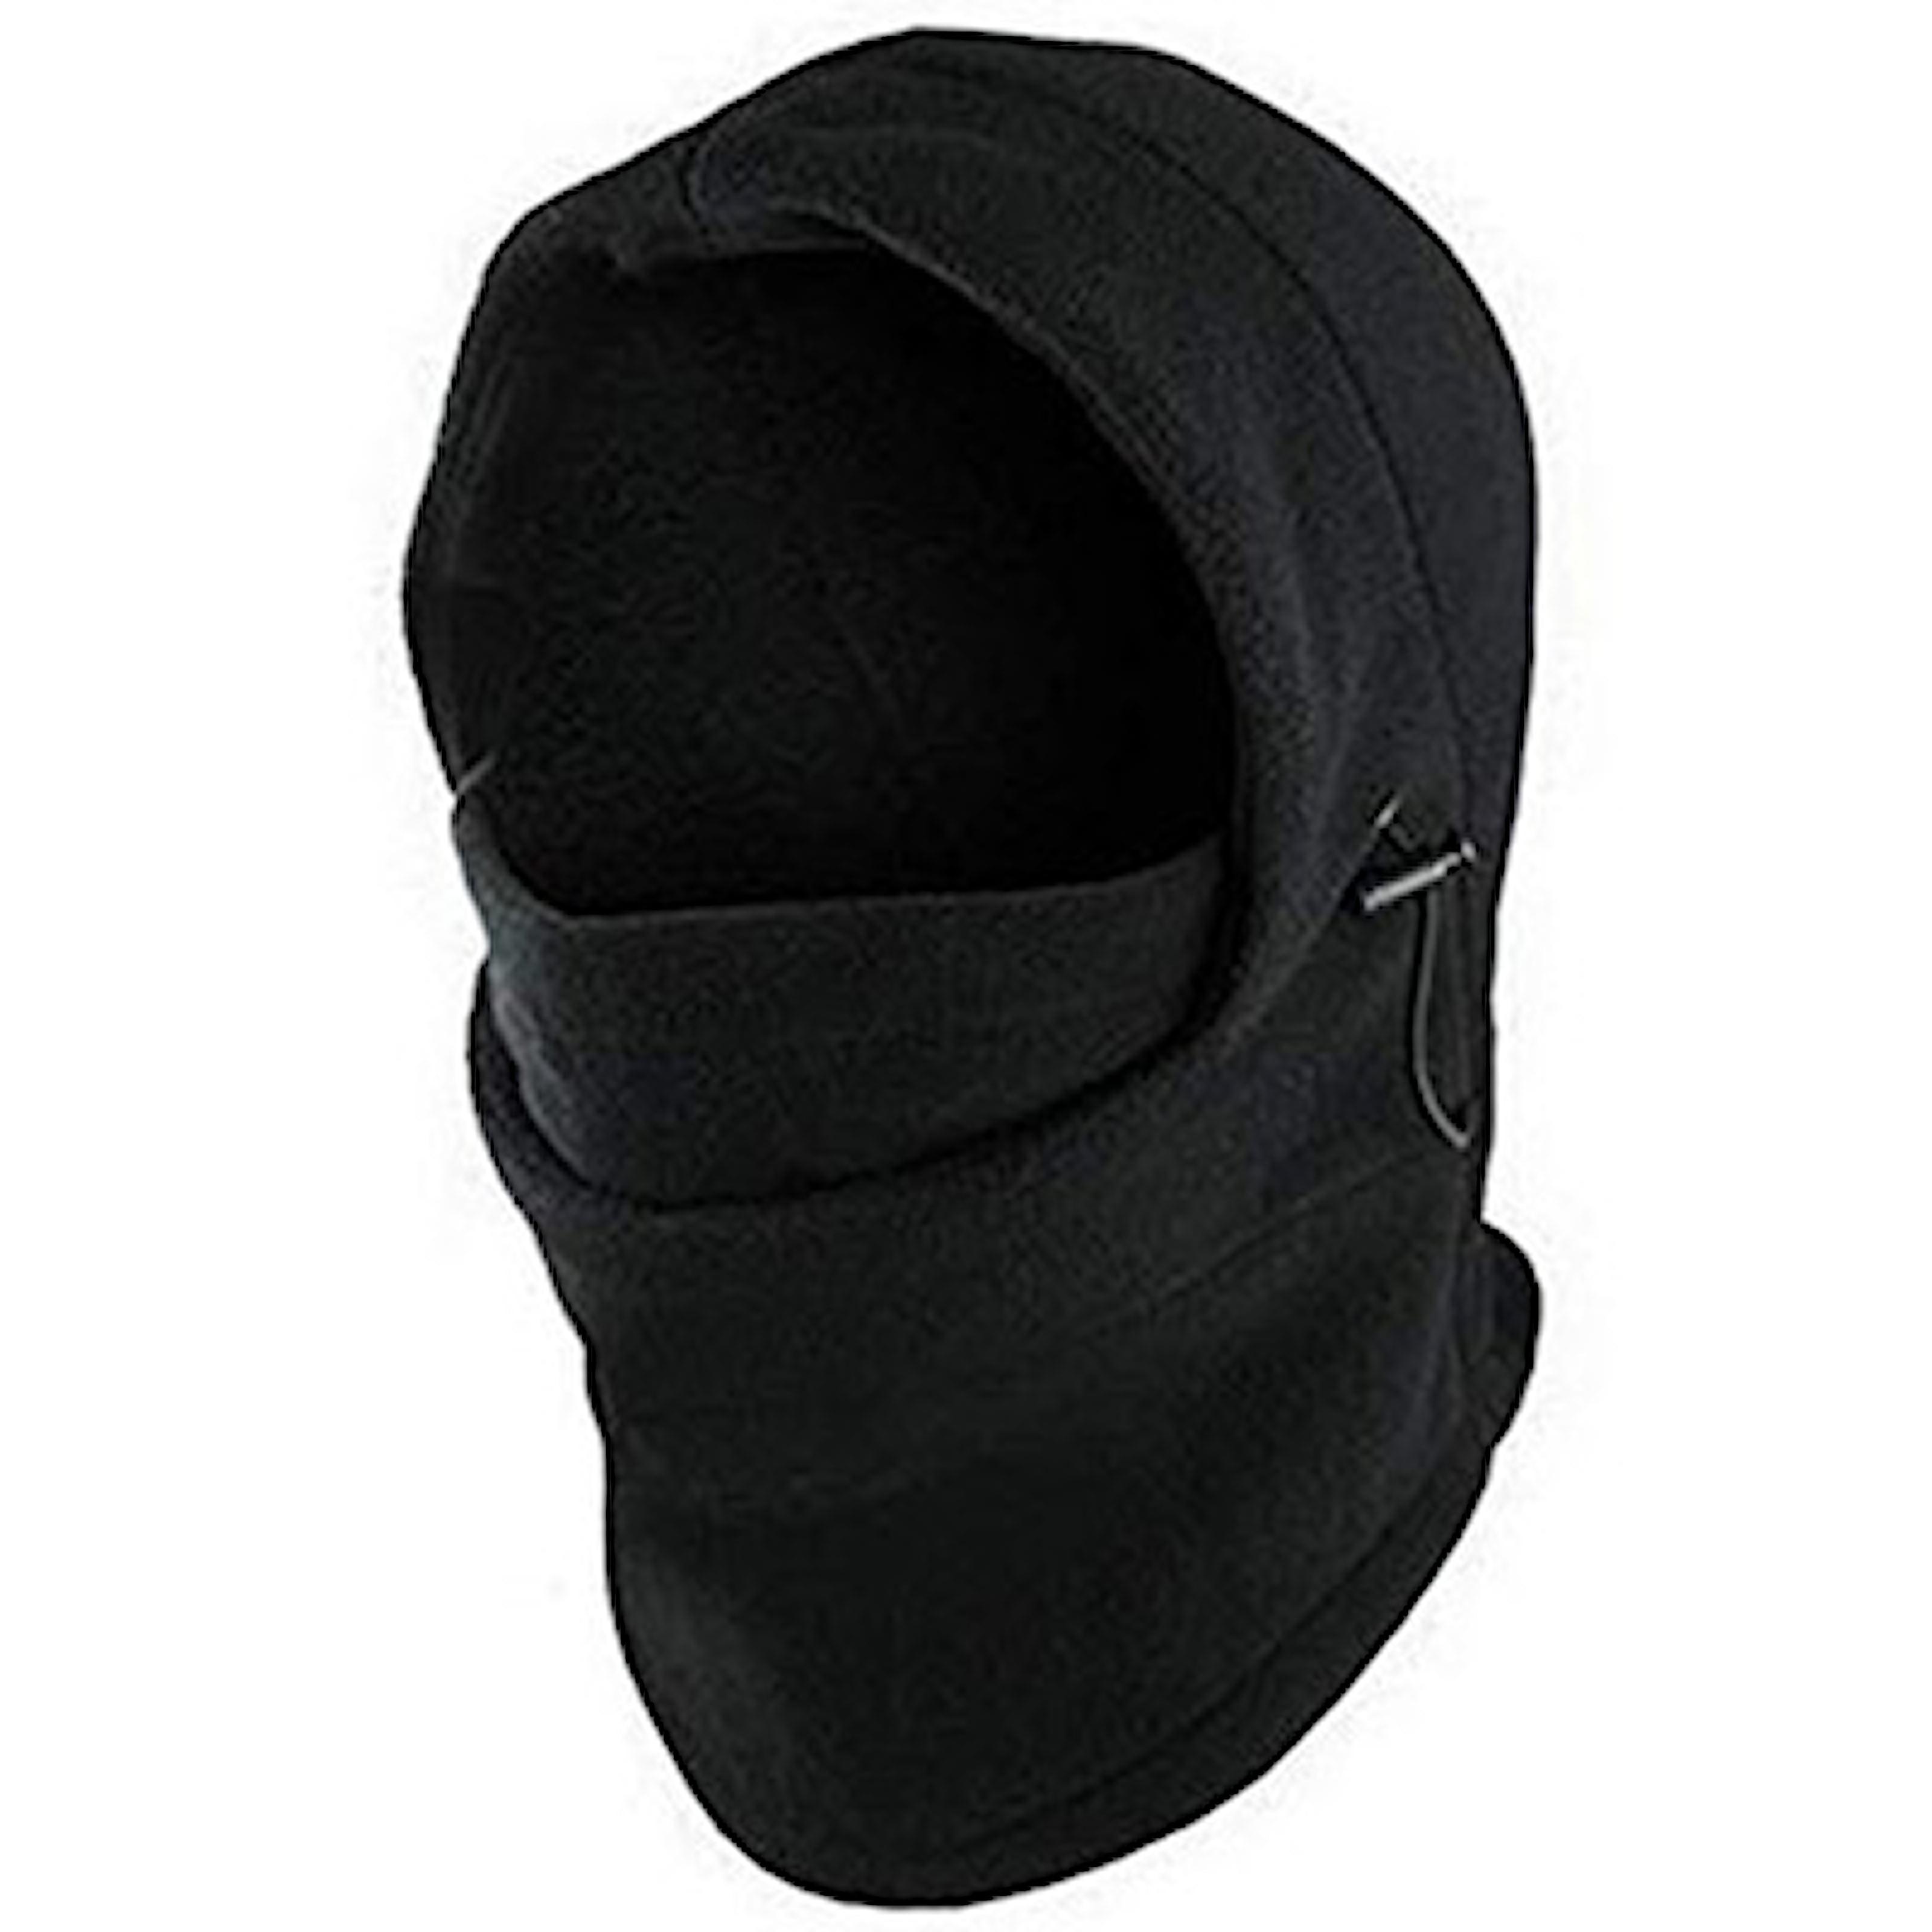 Svart, Thermal Winter Hats, 3 Colors, Balaclava, ,